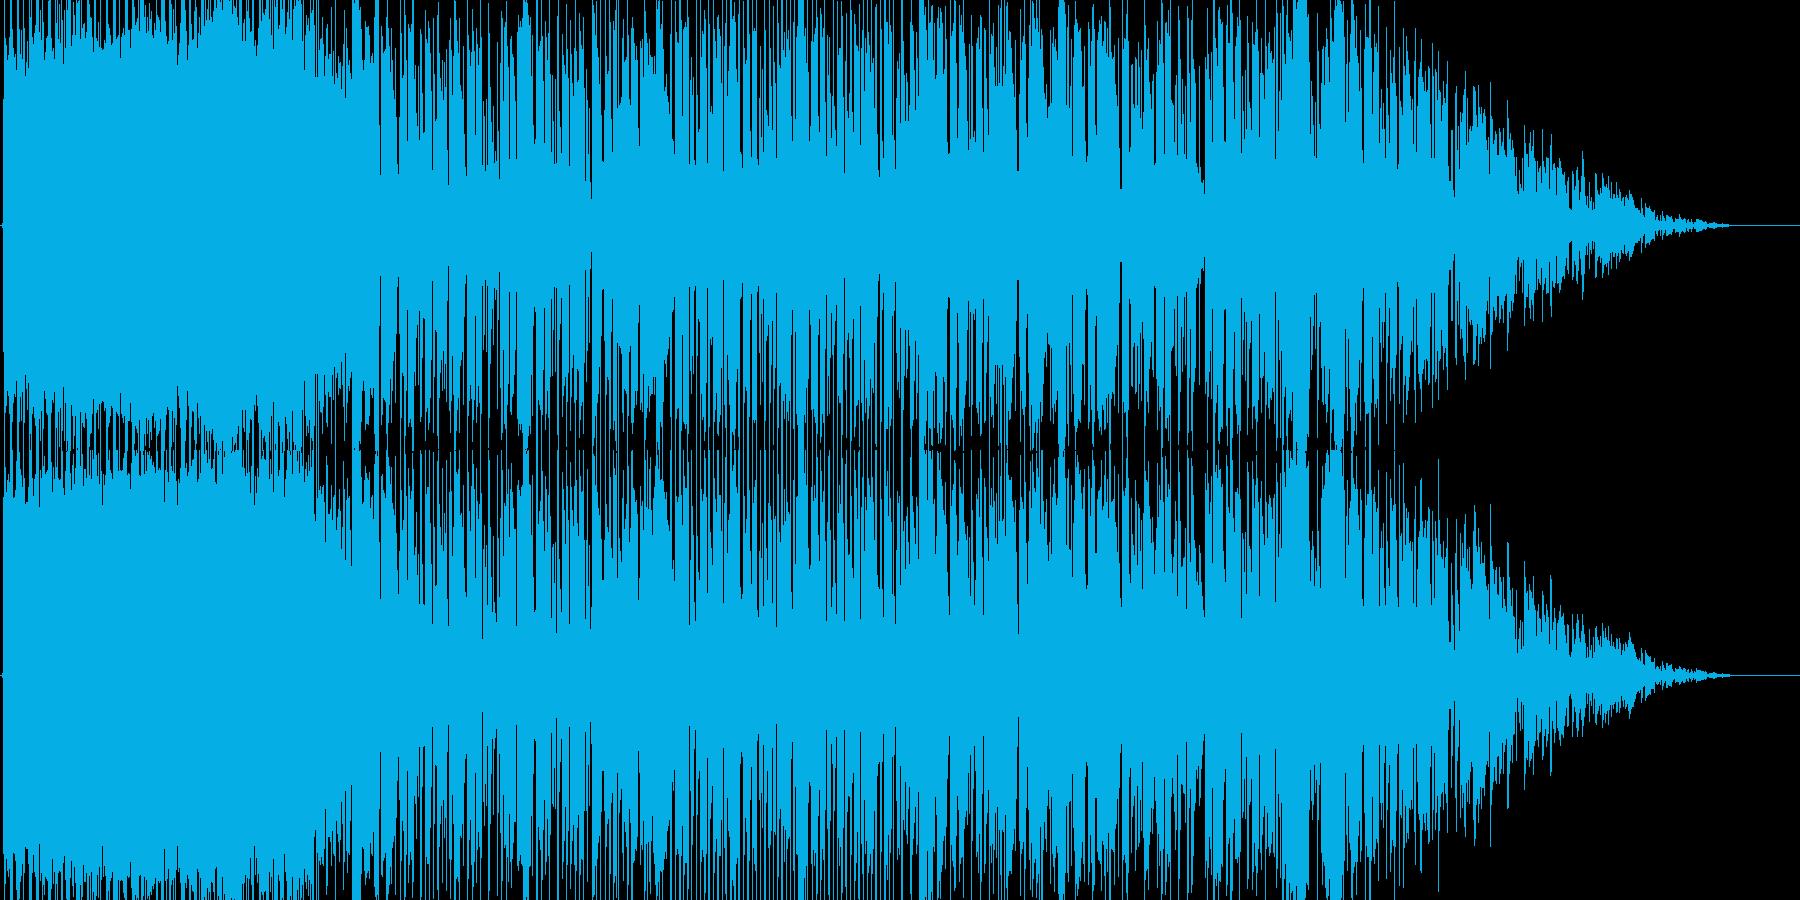 utashiro ~instead of song~の再生済みの波形